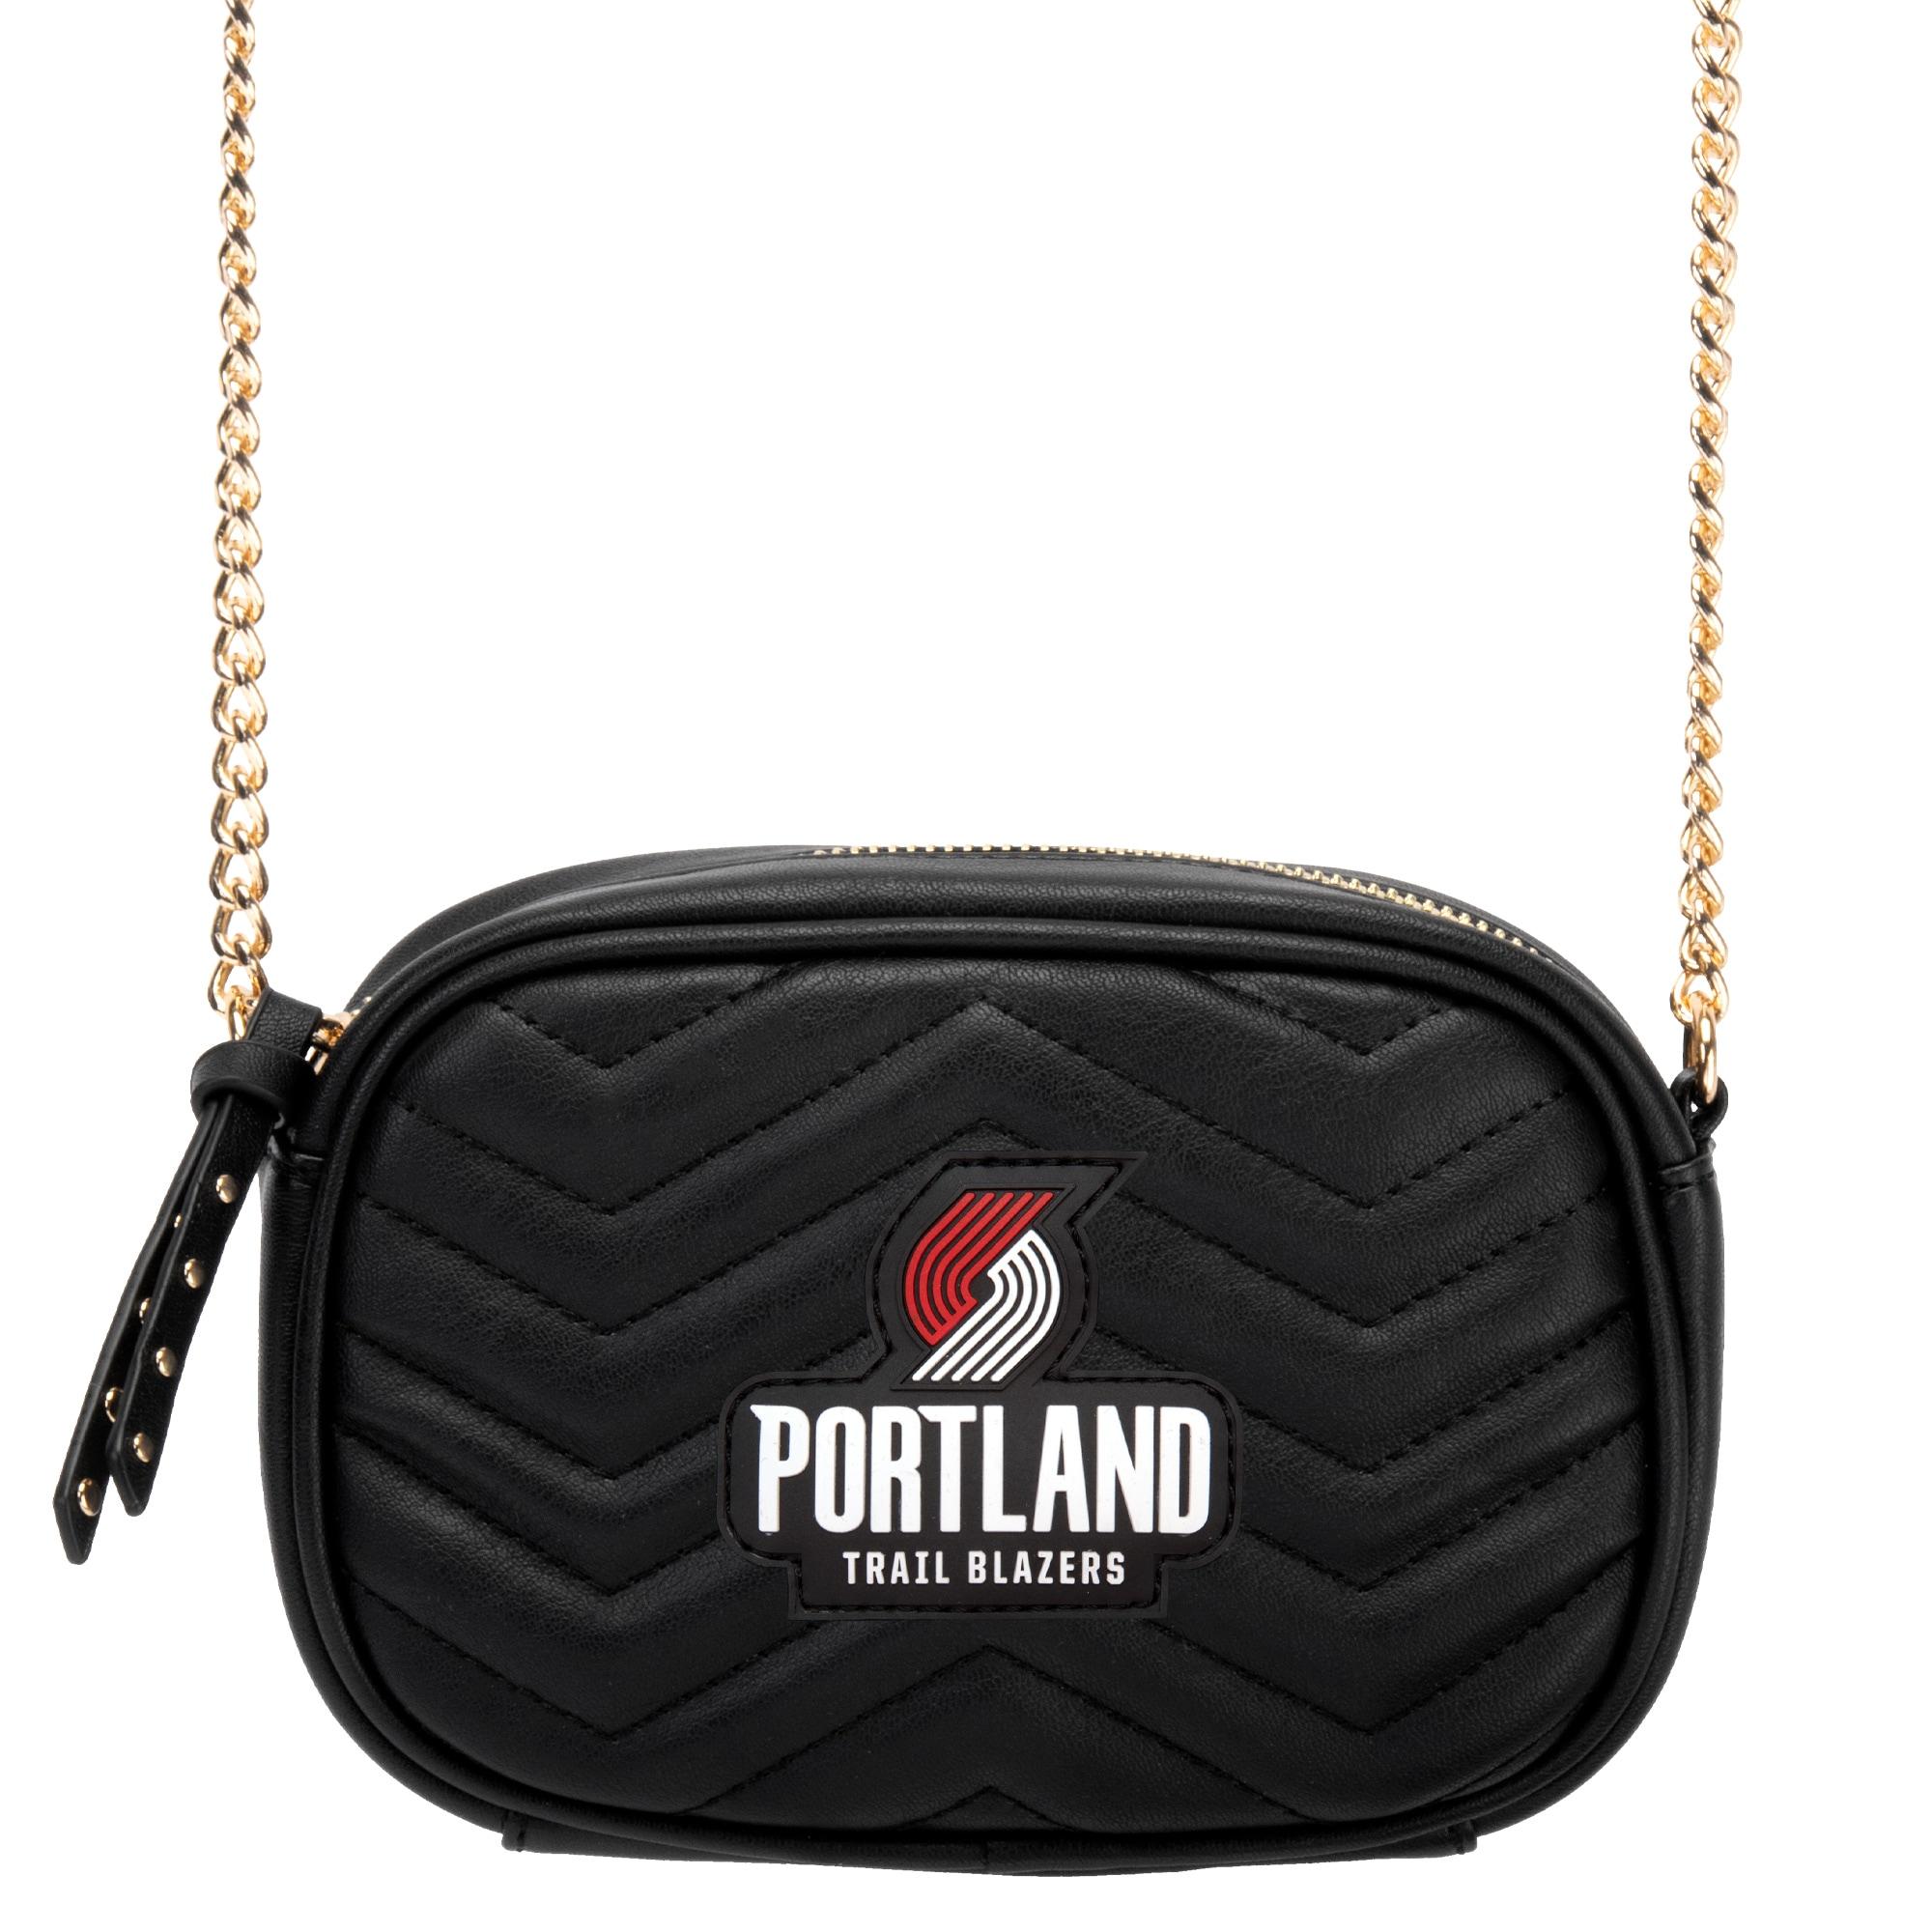 Portland Trail Blazers Women's Crossbody Bag - Black